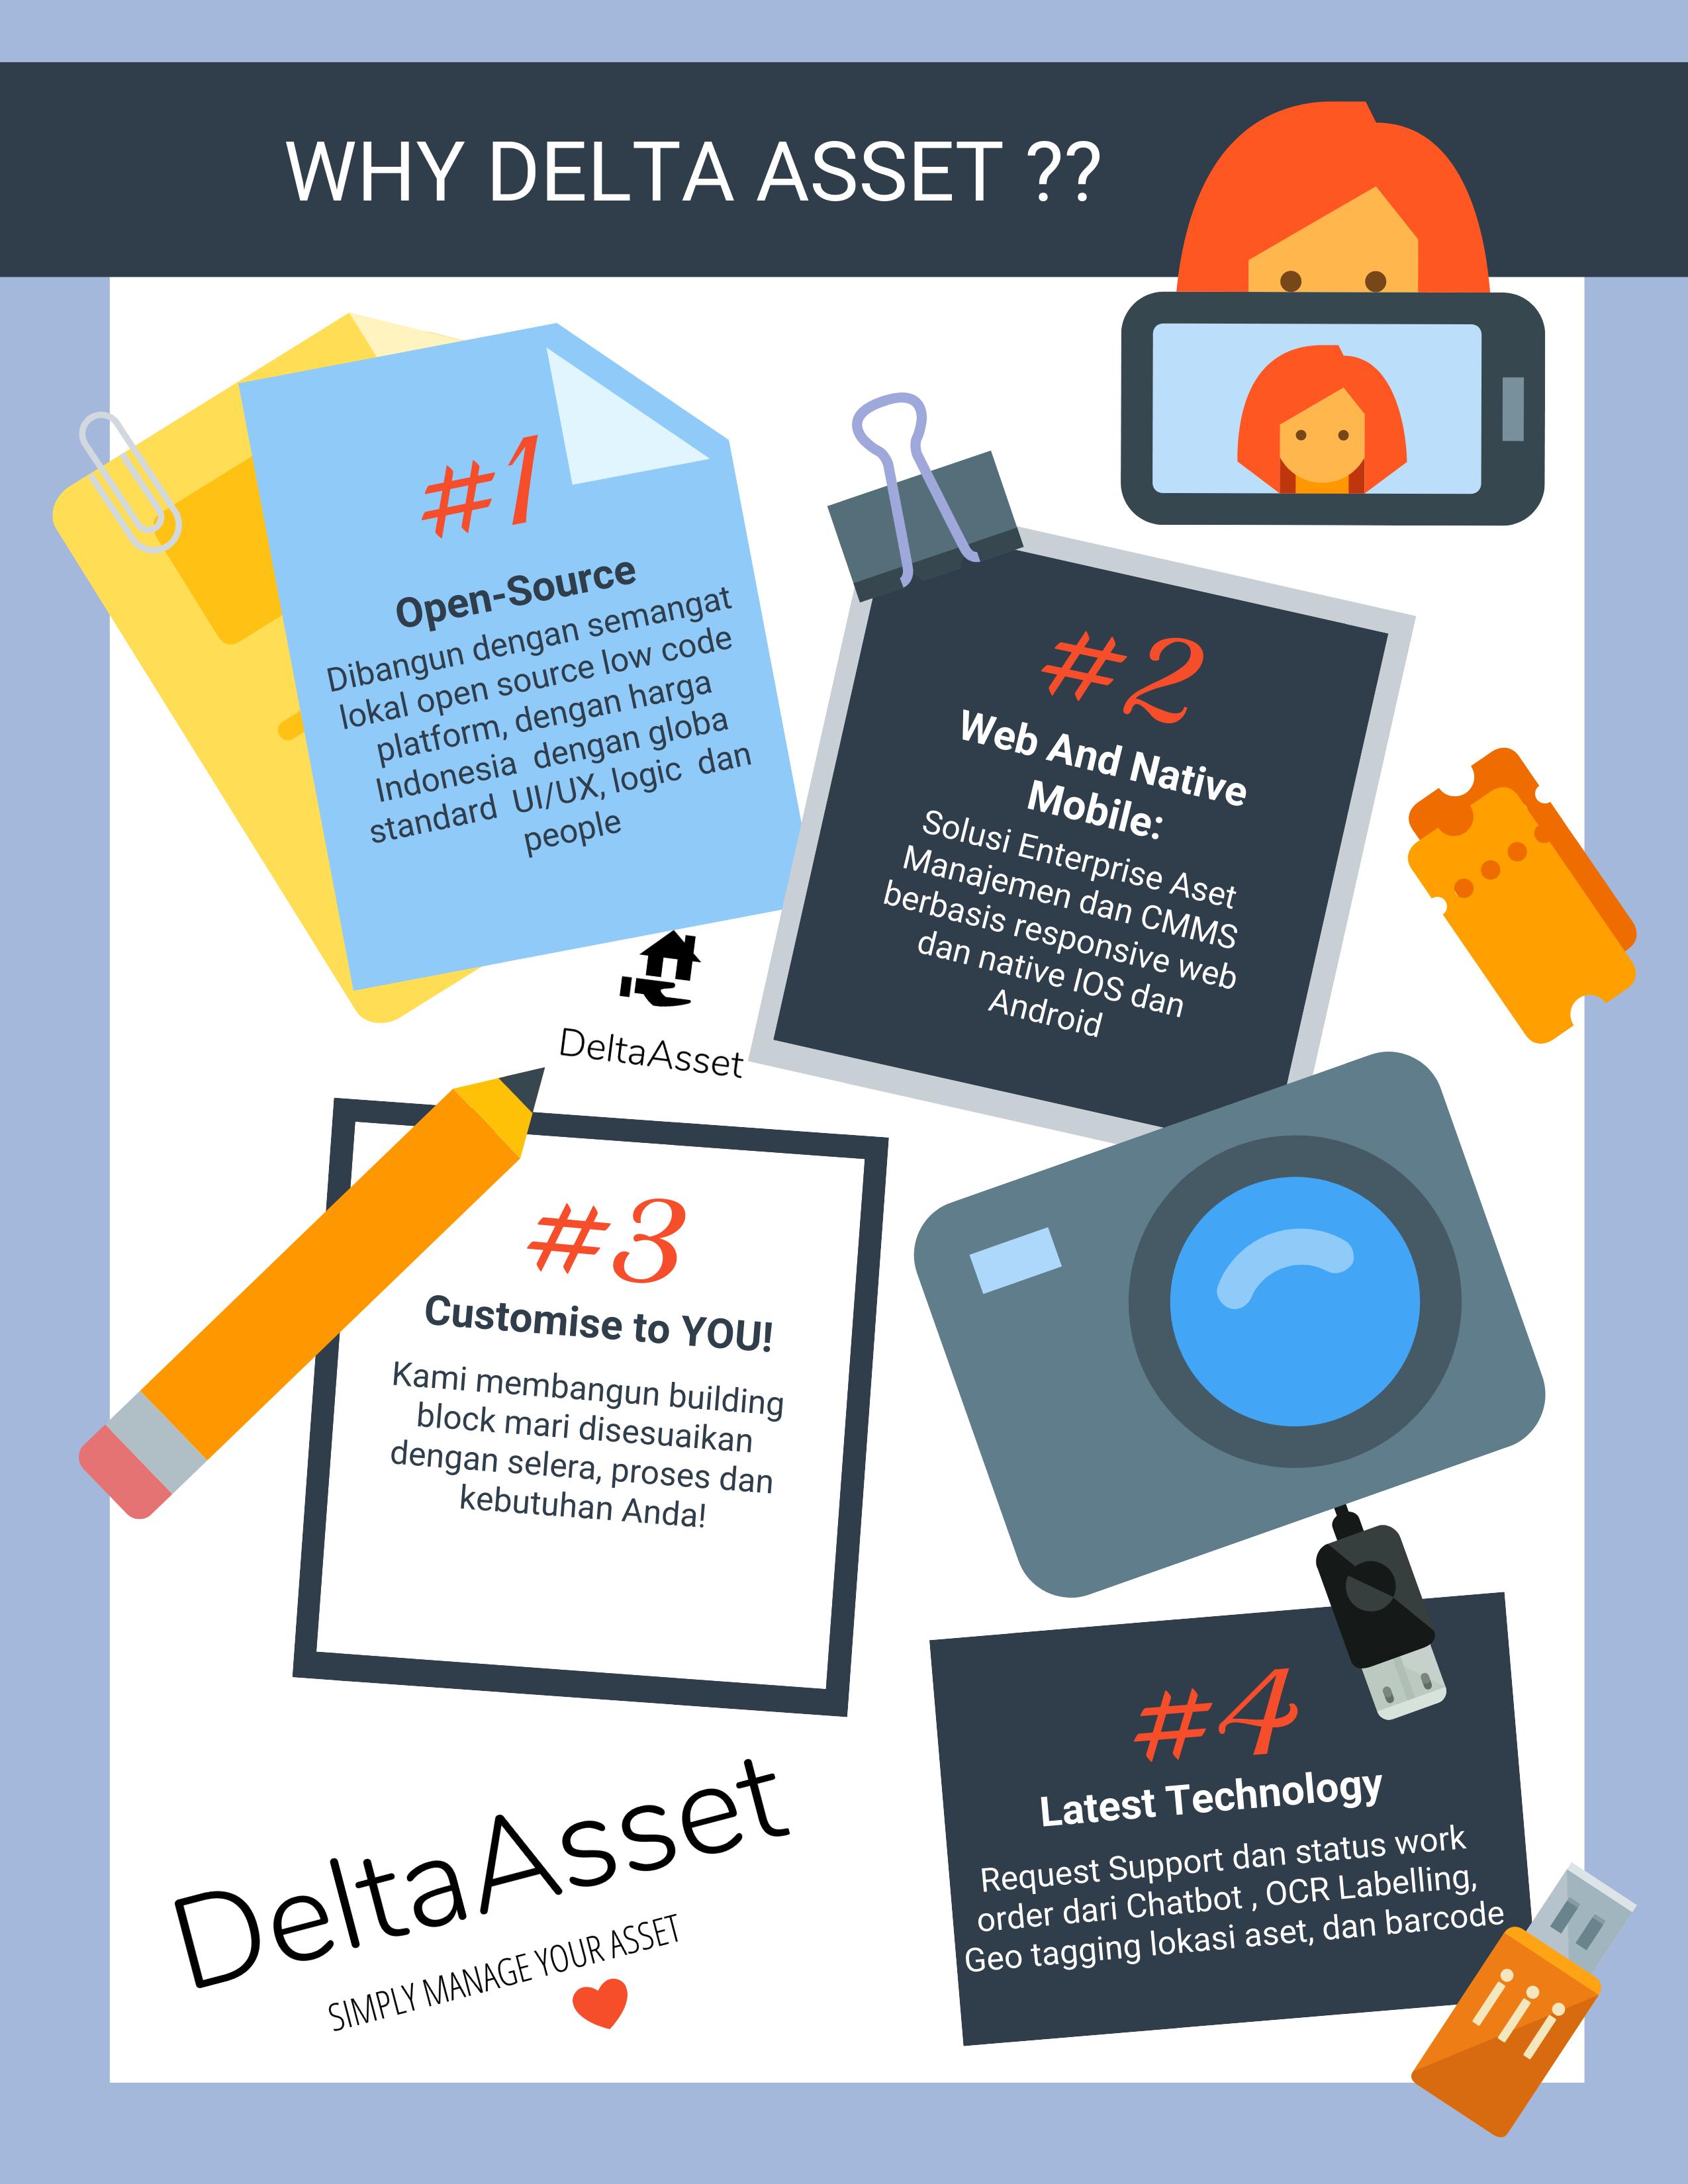 Why Delta Asset